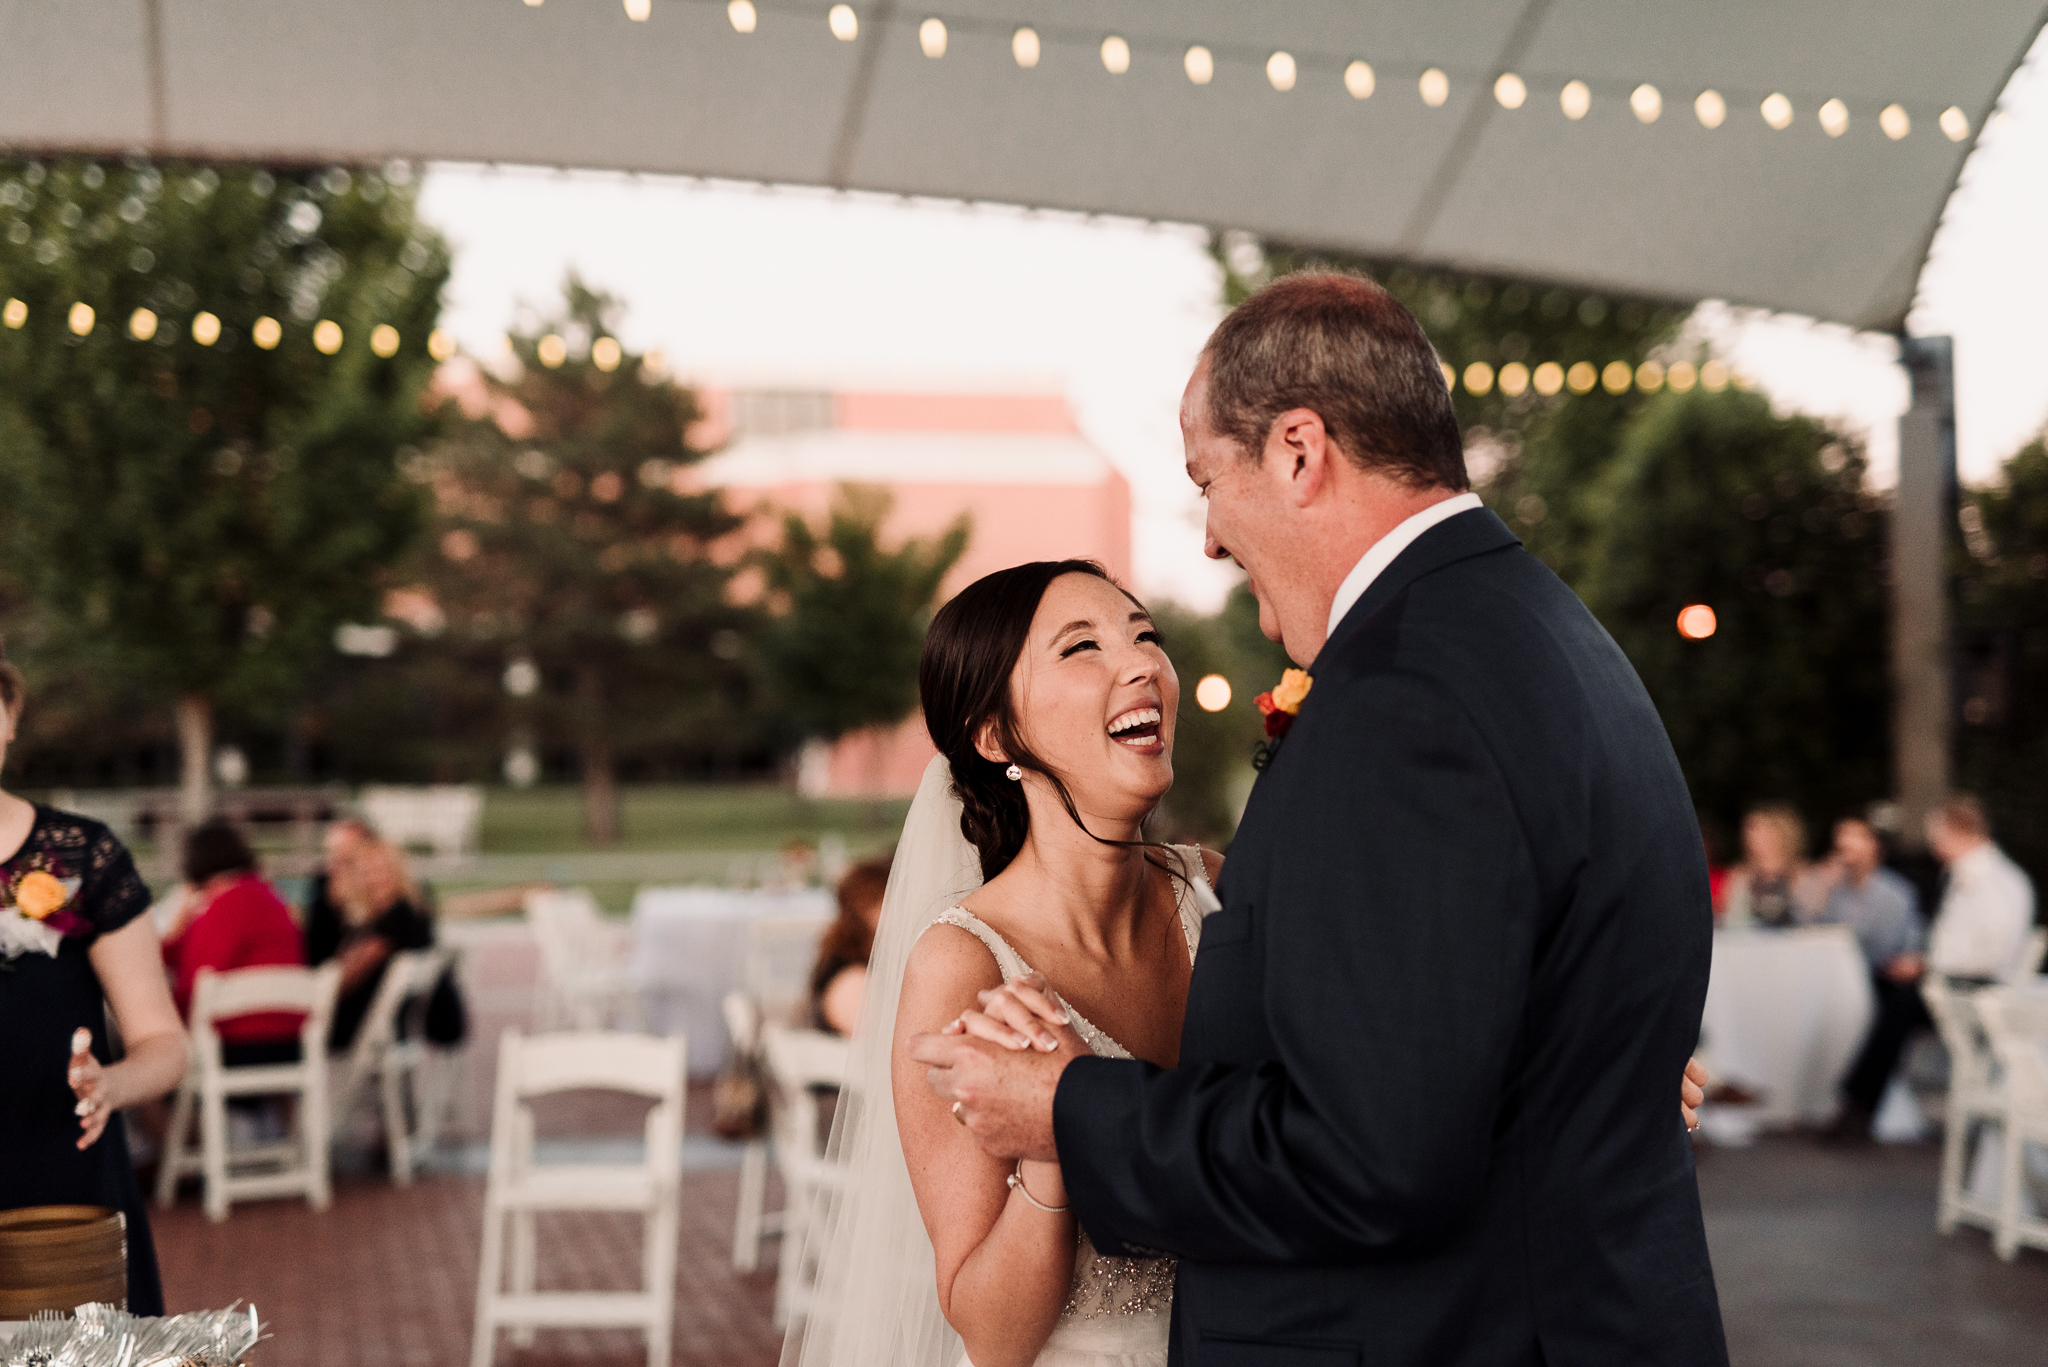 Oklahoma-Christian-University-Wedding-9251.jpg